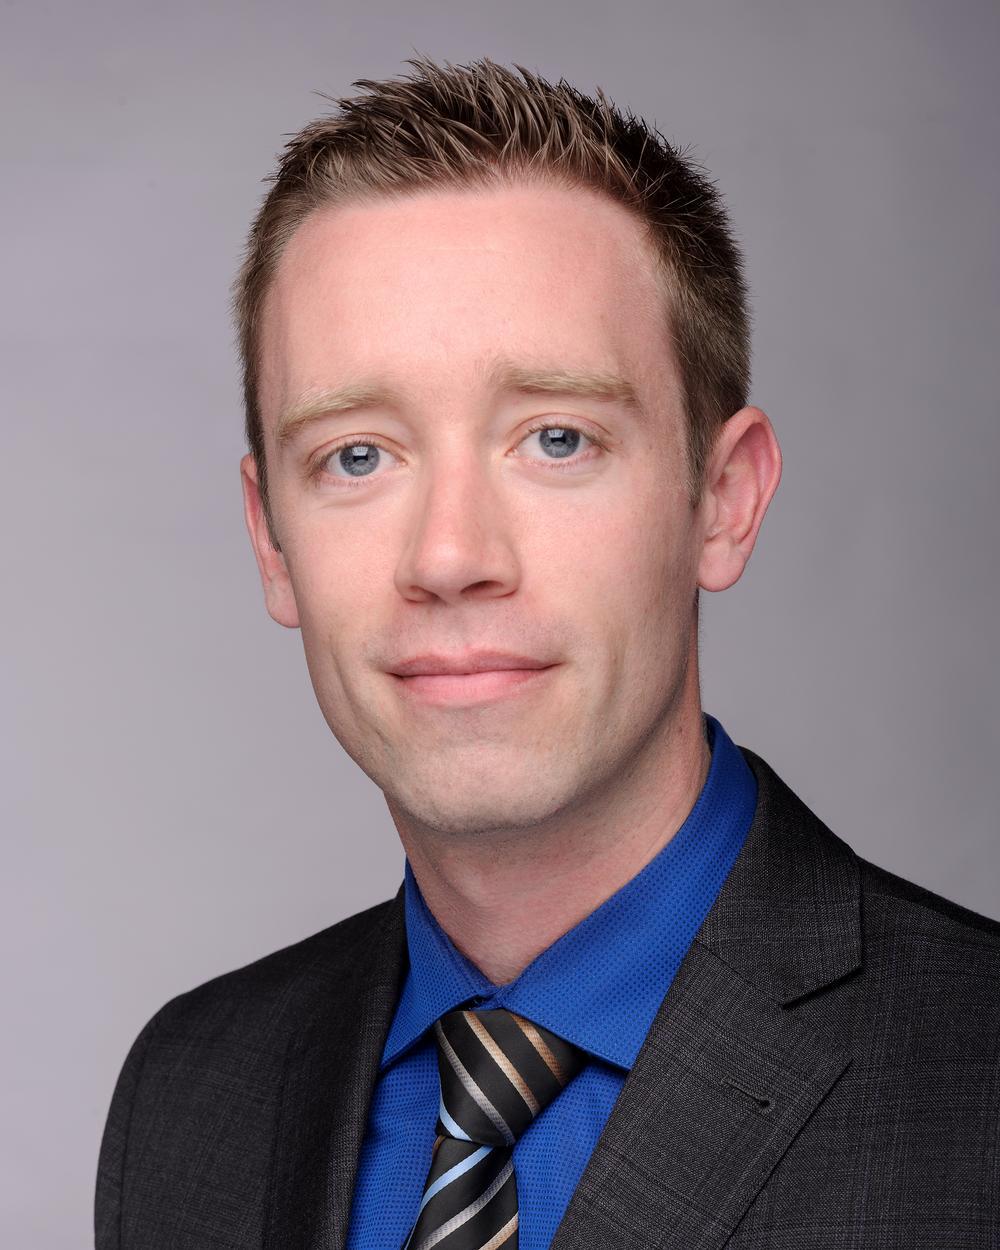 Jonathan Nesbitt, CFP, Hons. B.MOS Photo